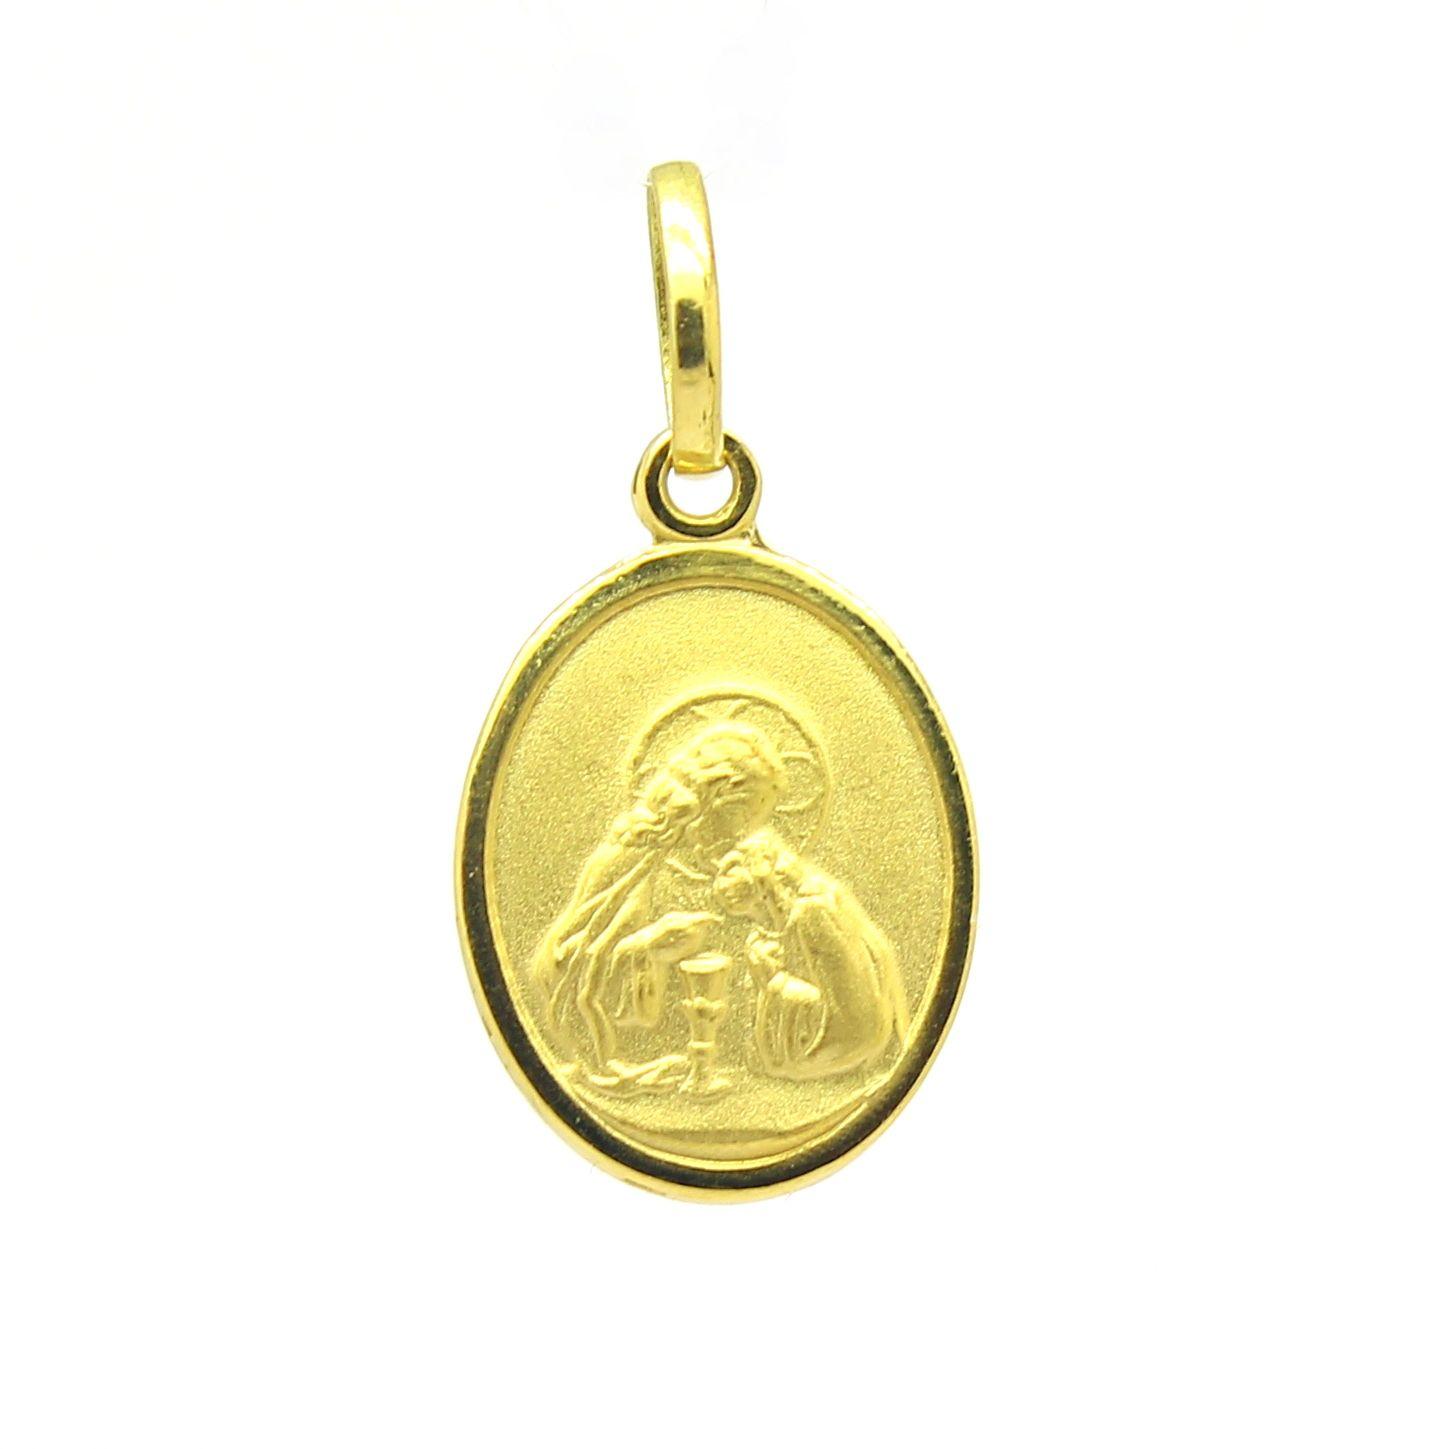 364032c4cdf88 Pingente Primeira Eucaristia Ouro Amarelo 18k 750 - Marcio Joalheiros   Marcio  Joalheiros